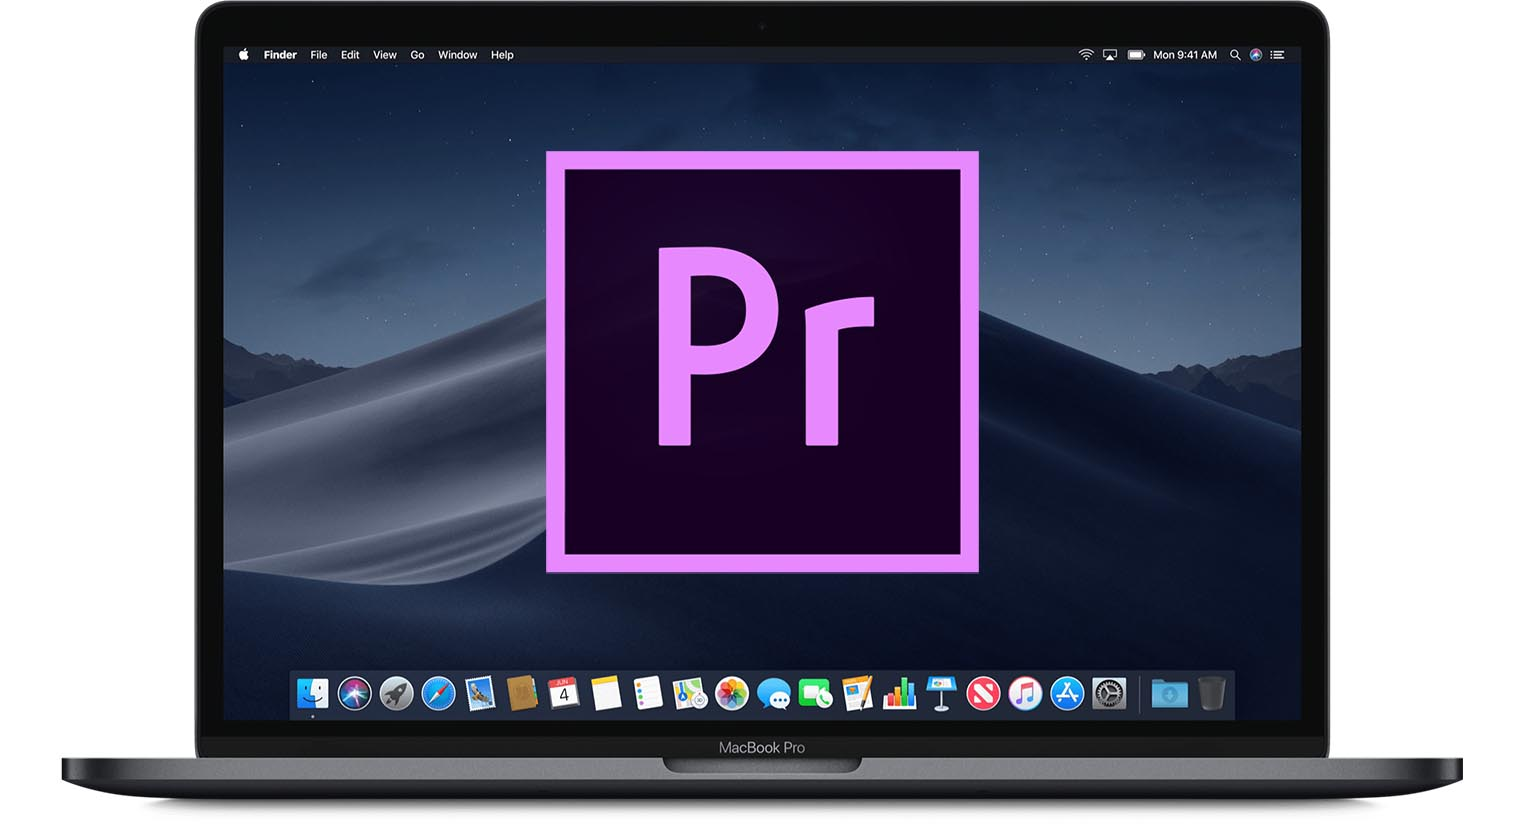 MacBook Pro Premiere Pro logo